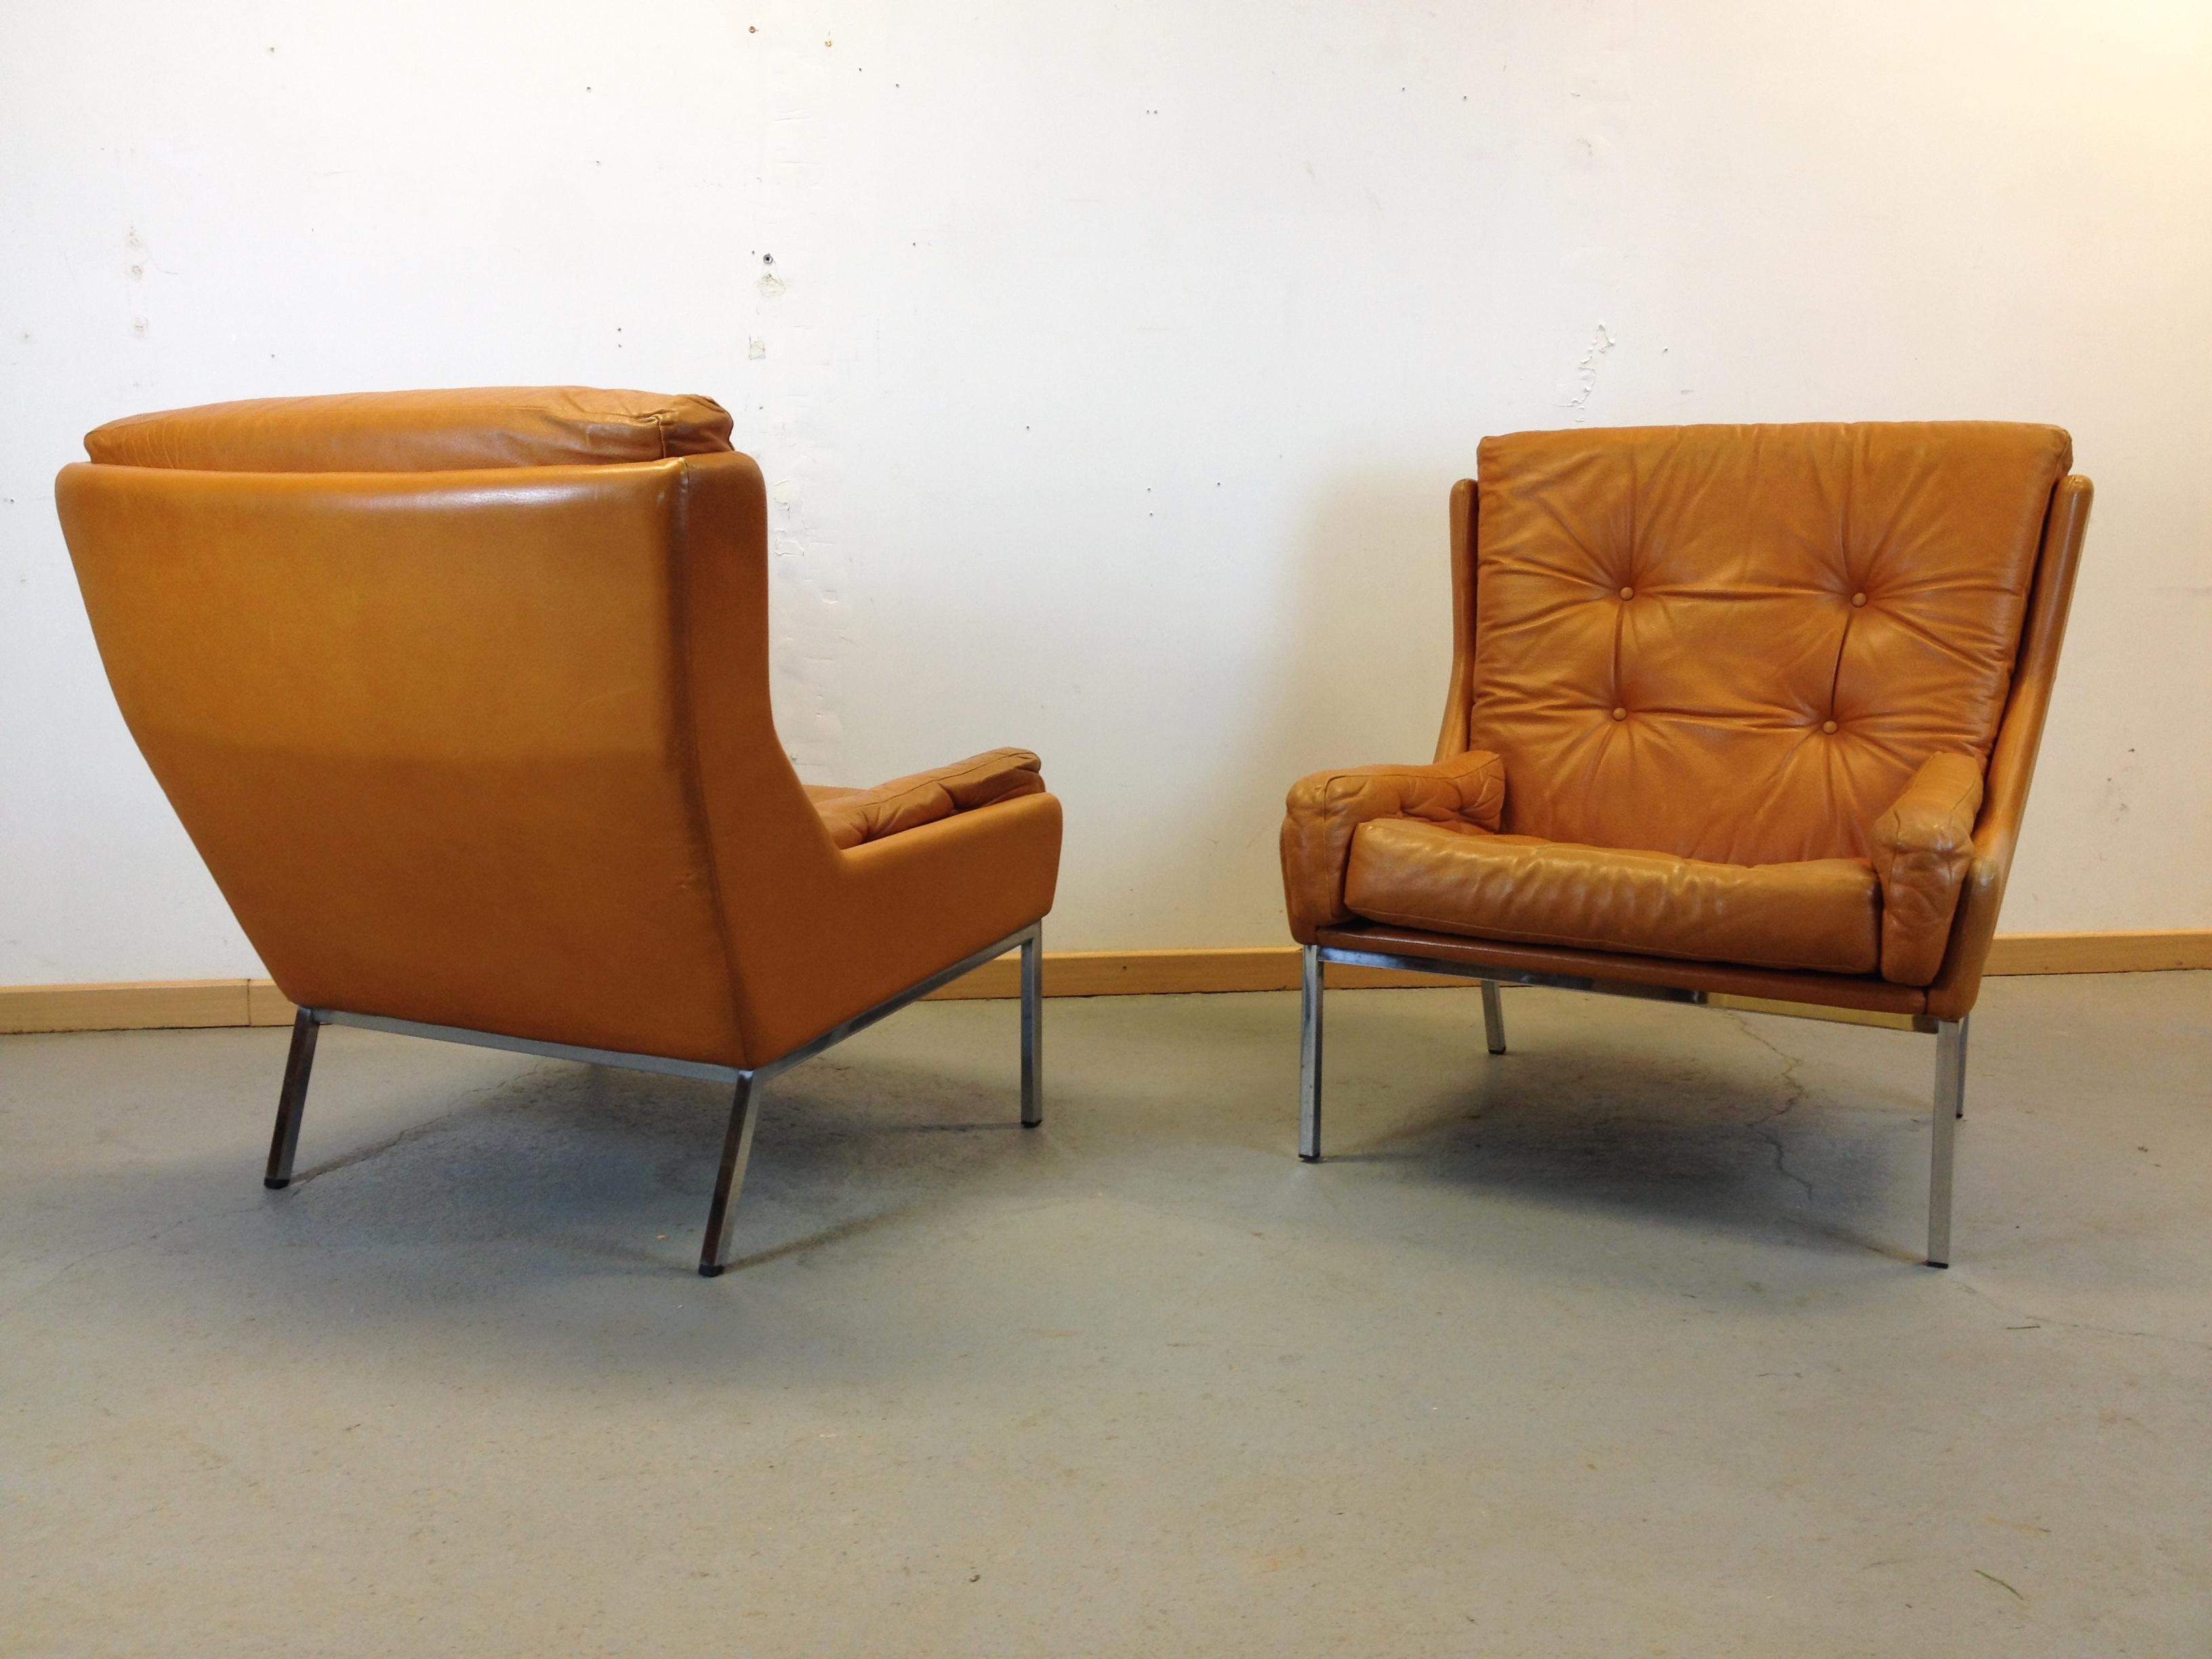 paire fauteuils scandinave cuir annee 70